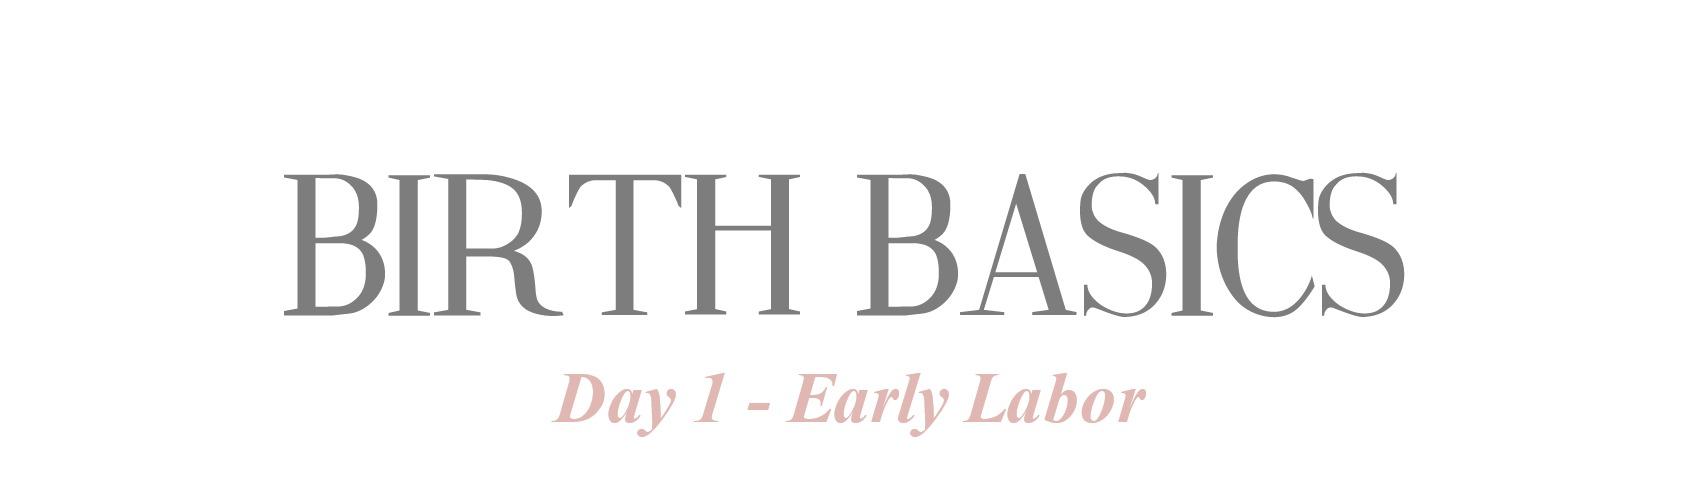 Birth Basics - Day 1 - Early Labor.jpg